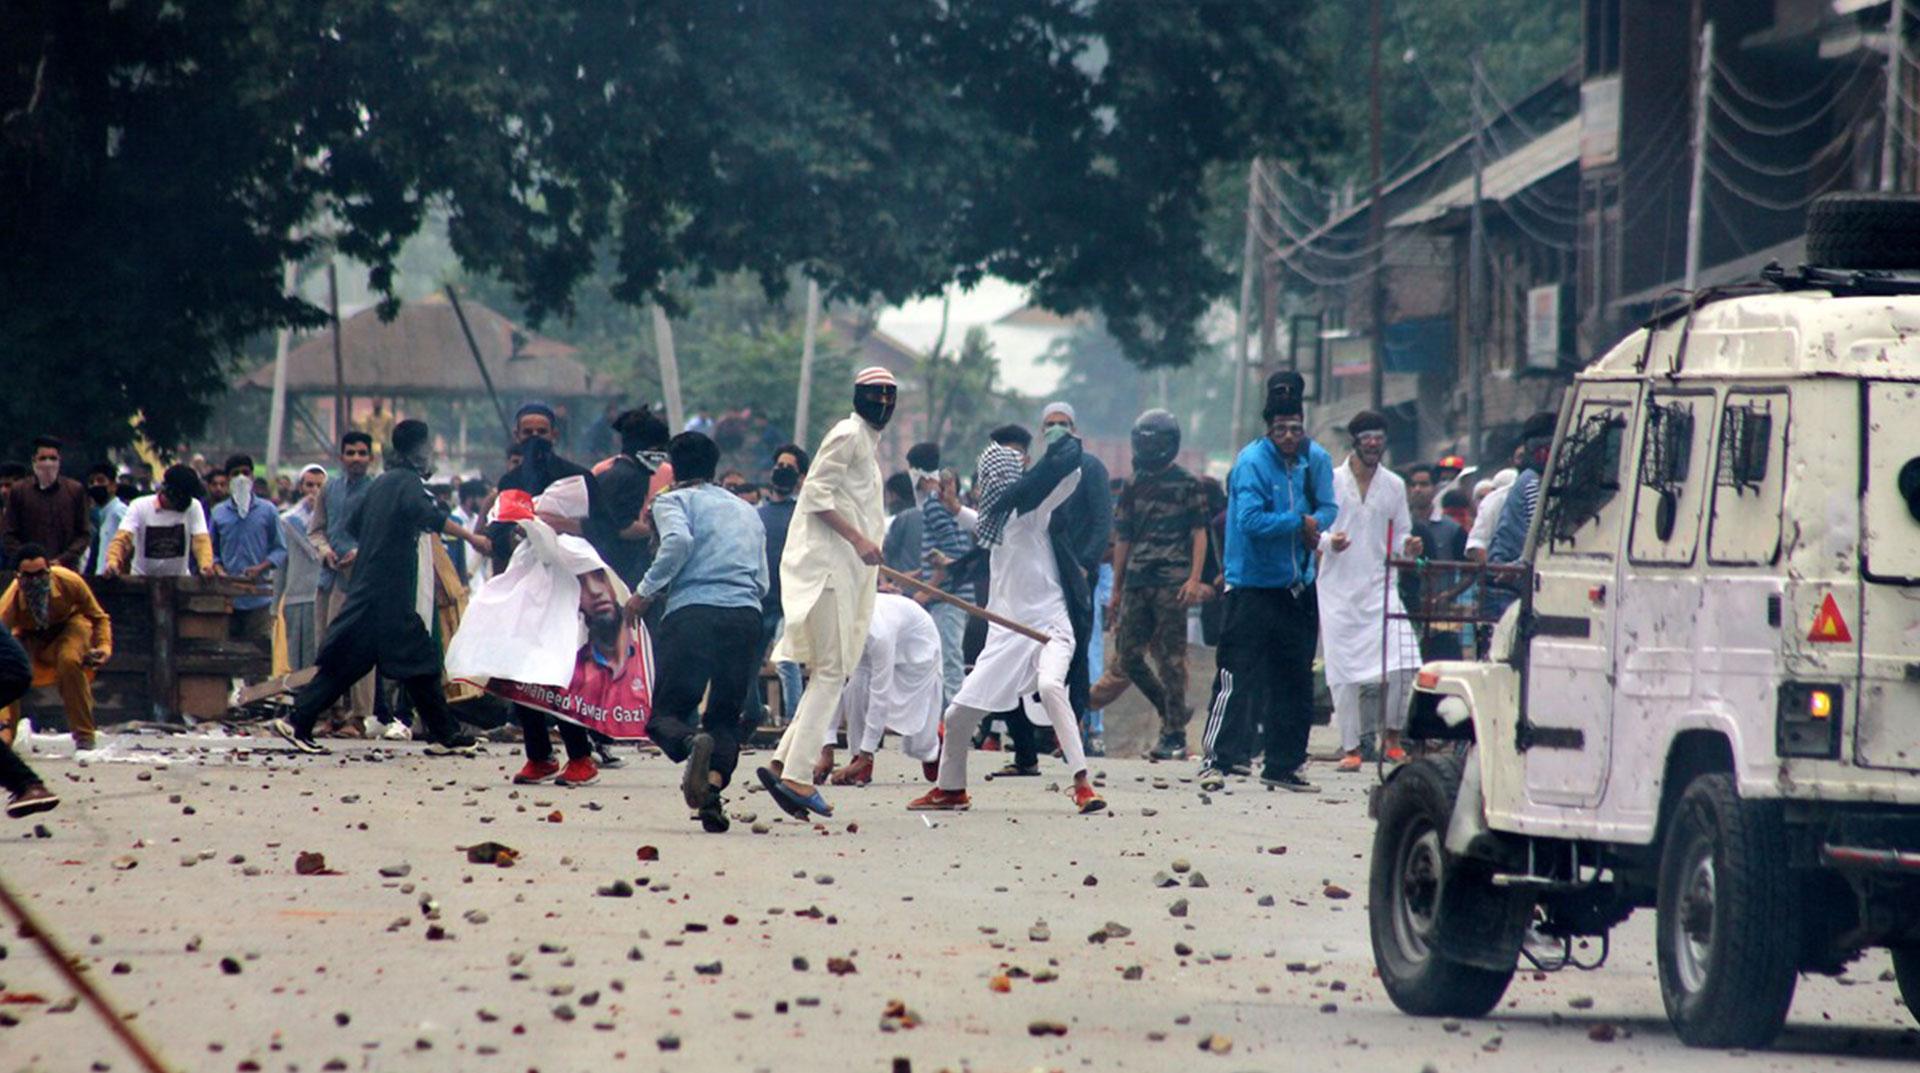 Keşmir'deki İhlaller Hindistan'a Kaybettirdi